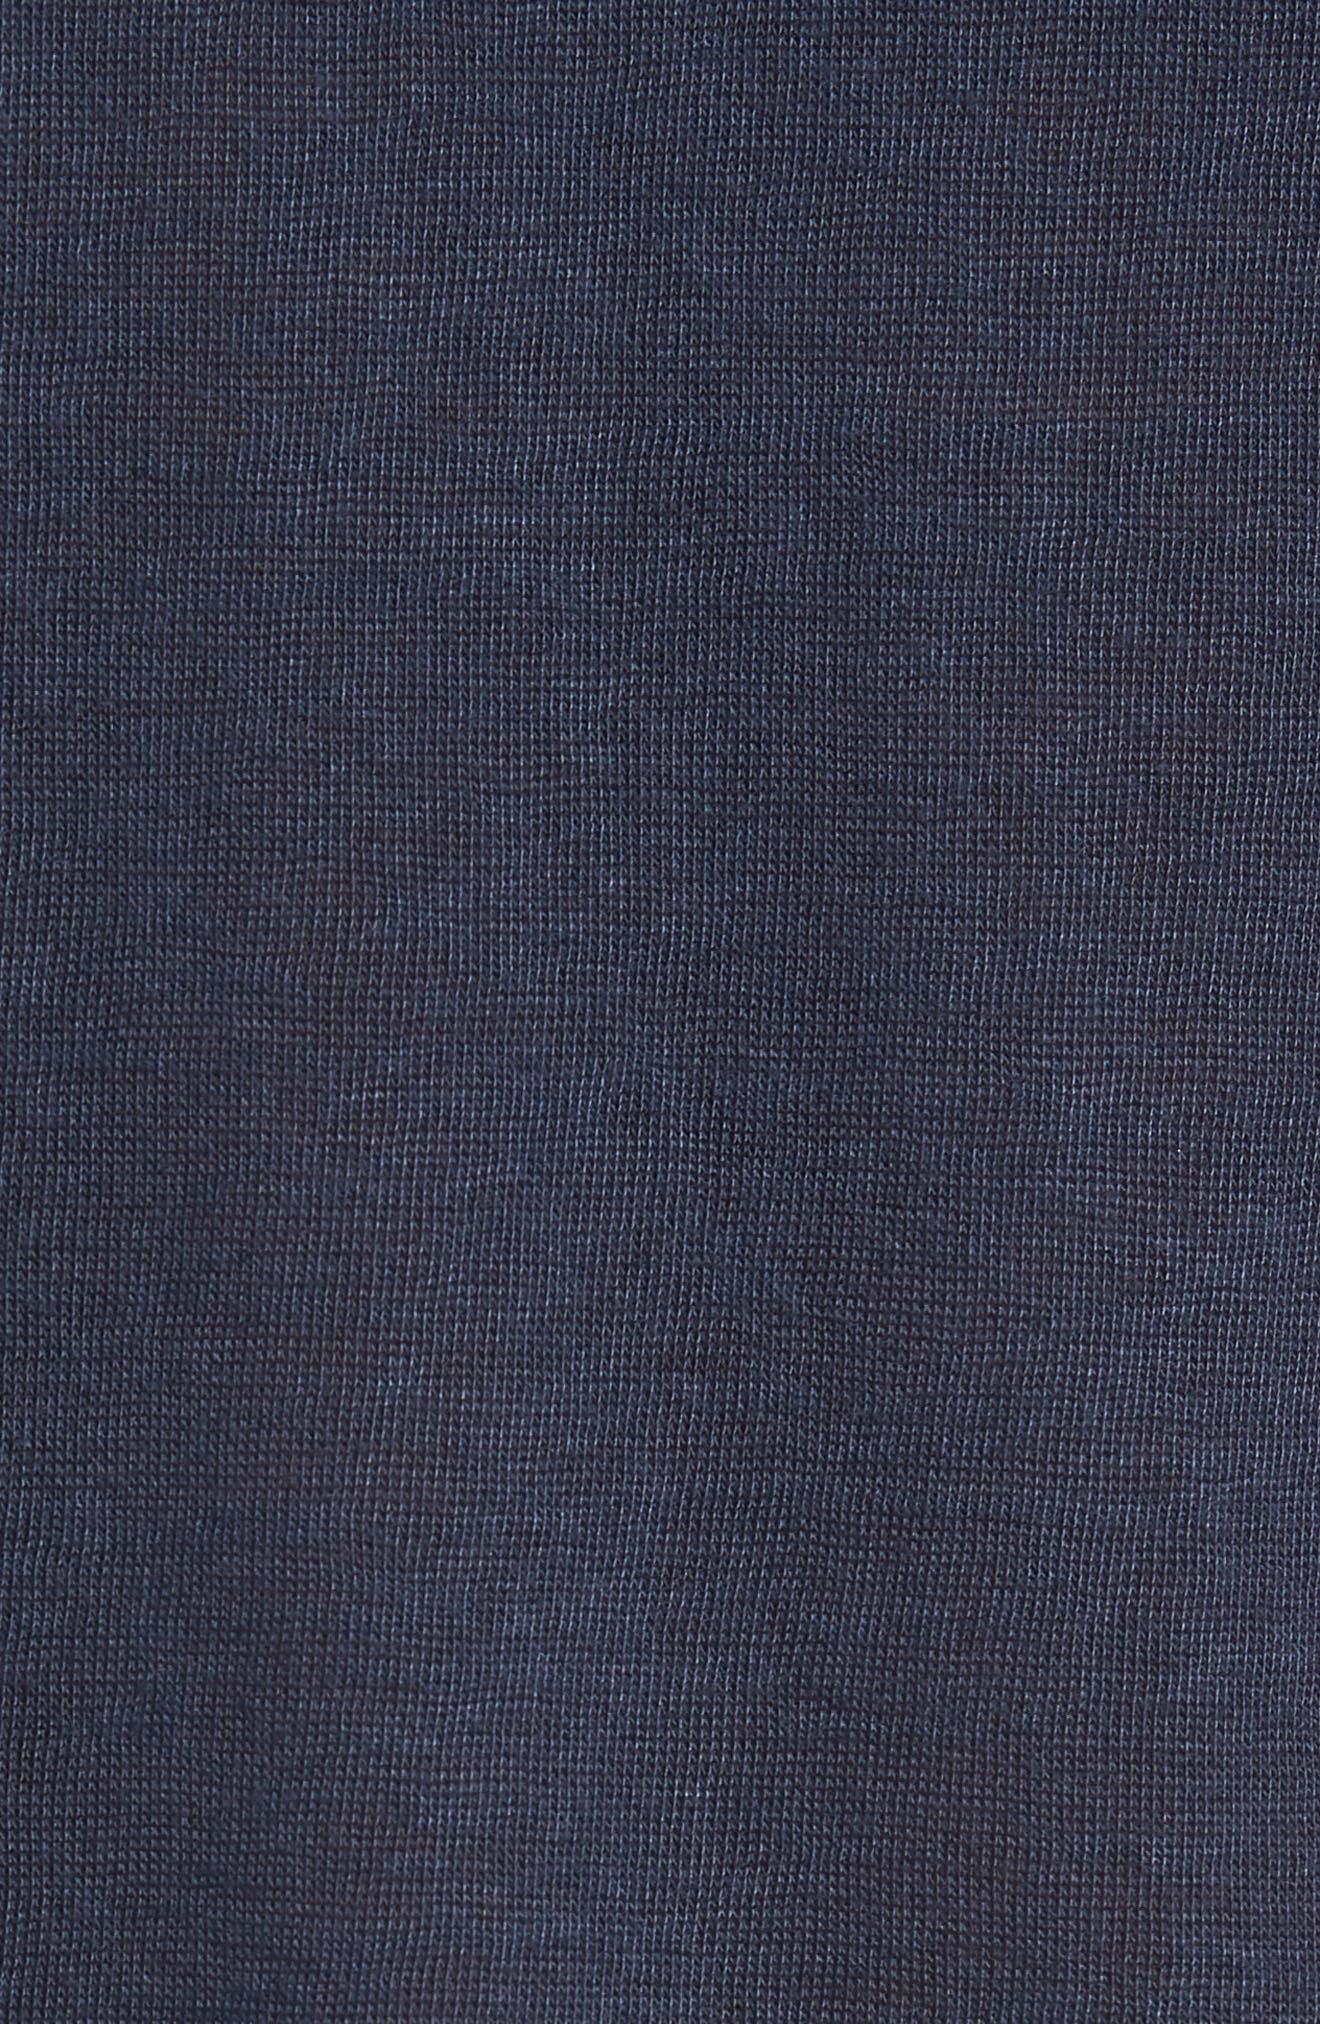 Dalmat Trim Fit Cotton & Modal Polo,                             Alternate thumbnail 5, color,                             410